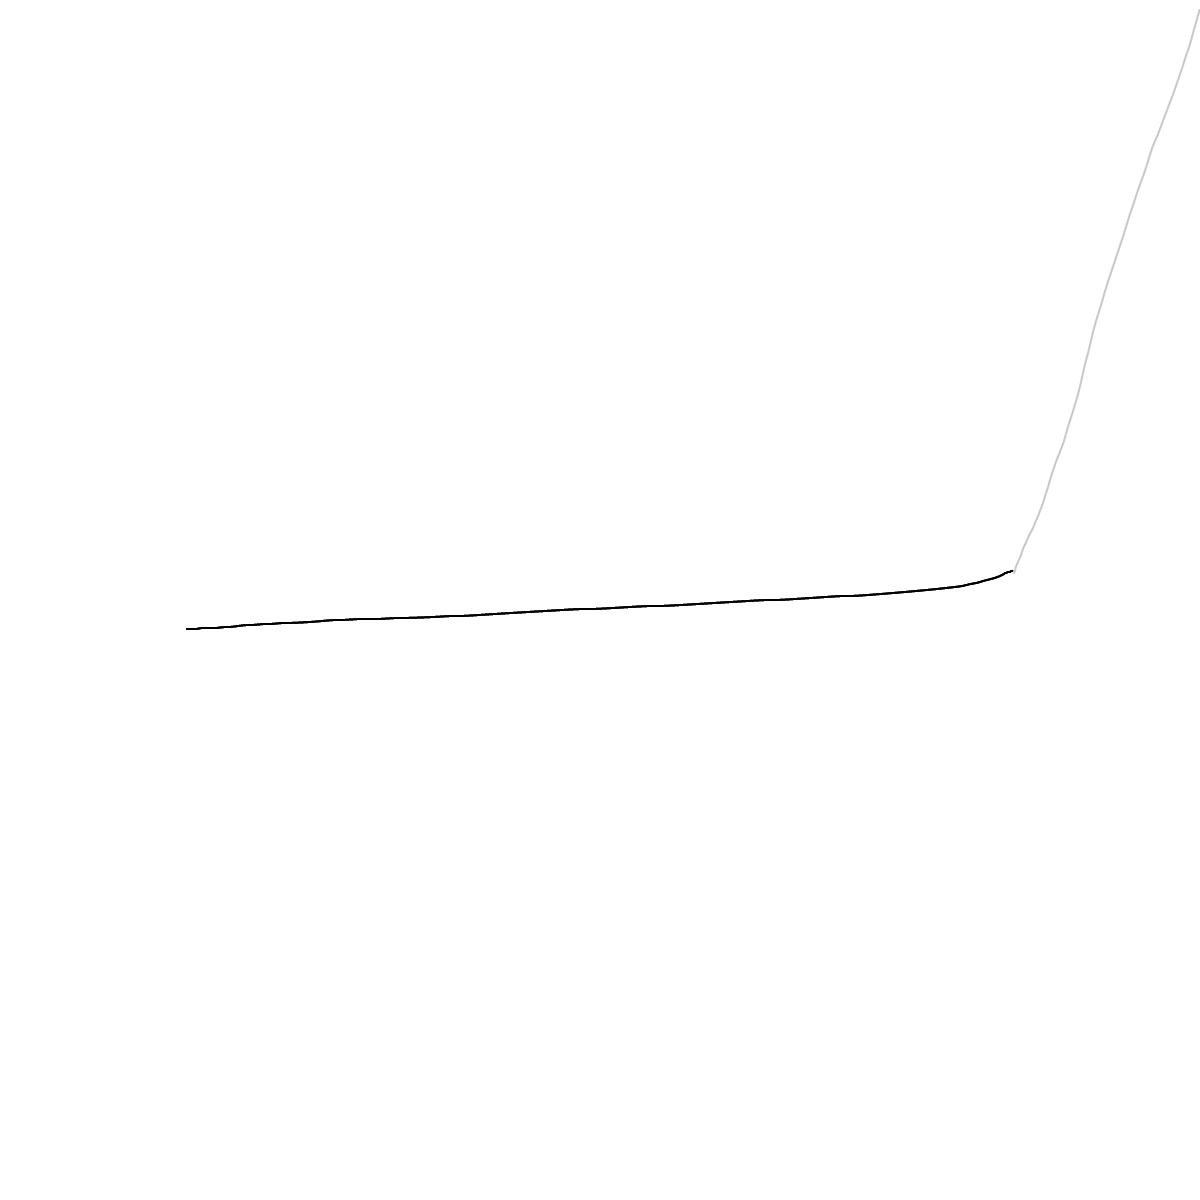 BAAAM drawing#18084 lat:40.7131080627441400lng: -74.0121383666992200